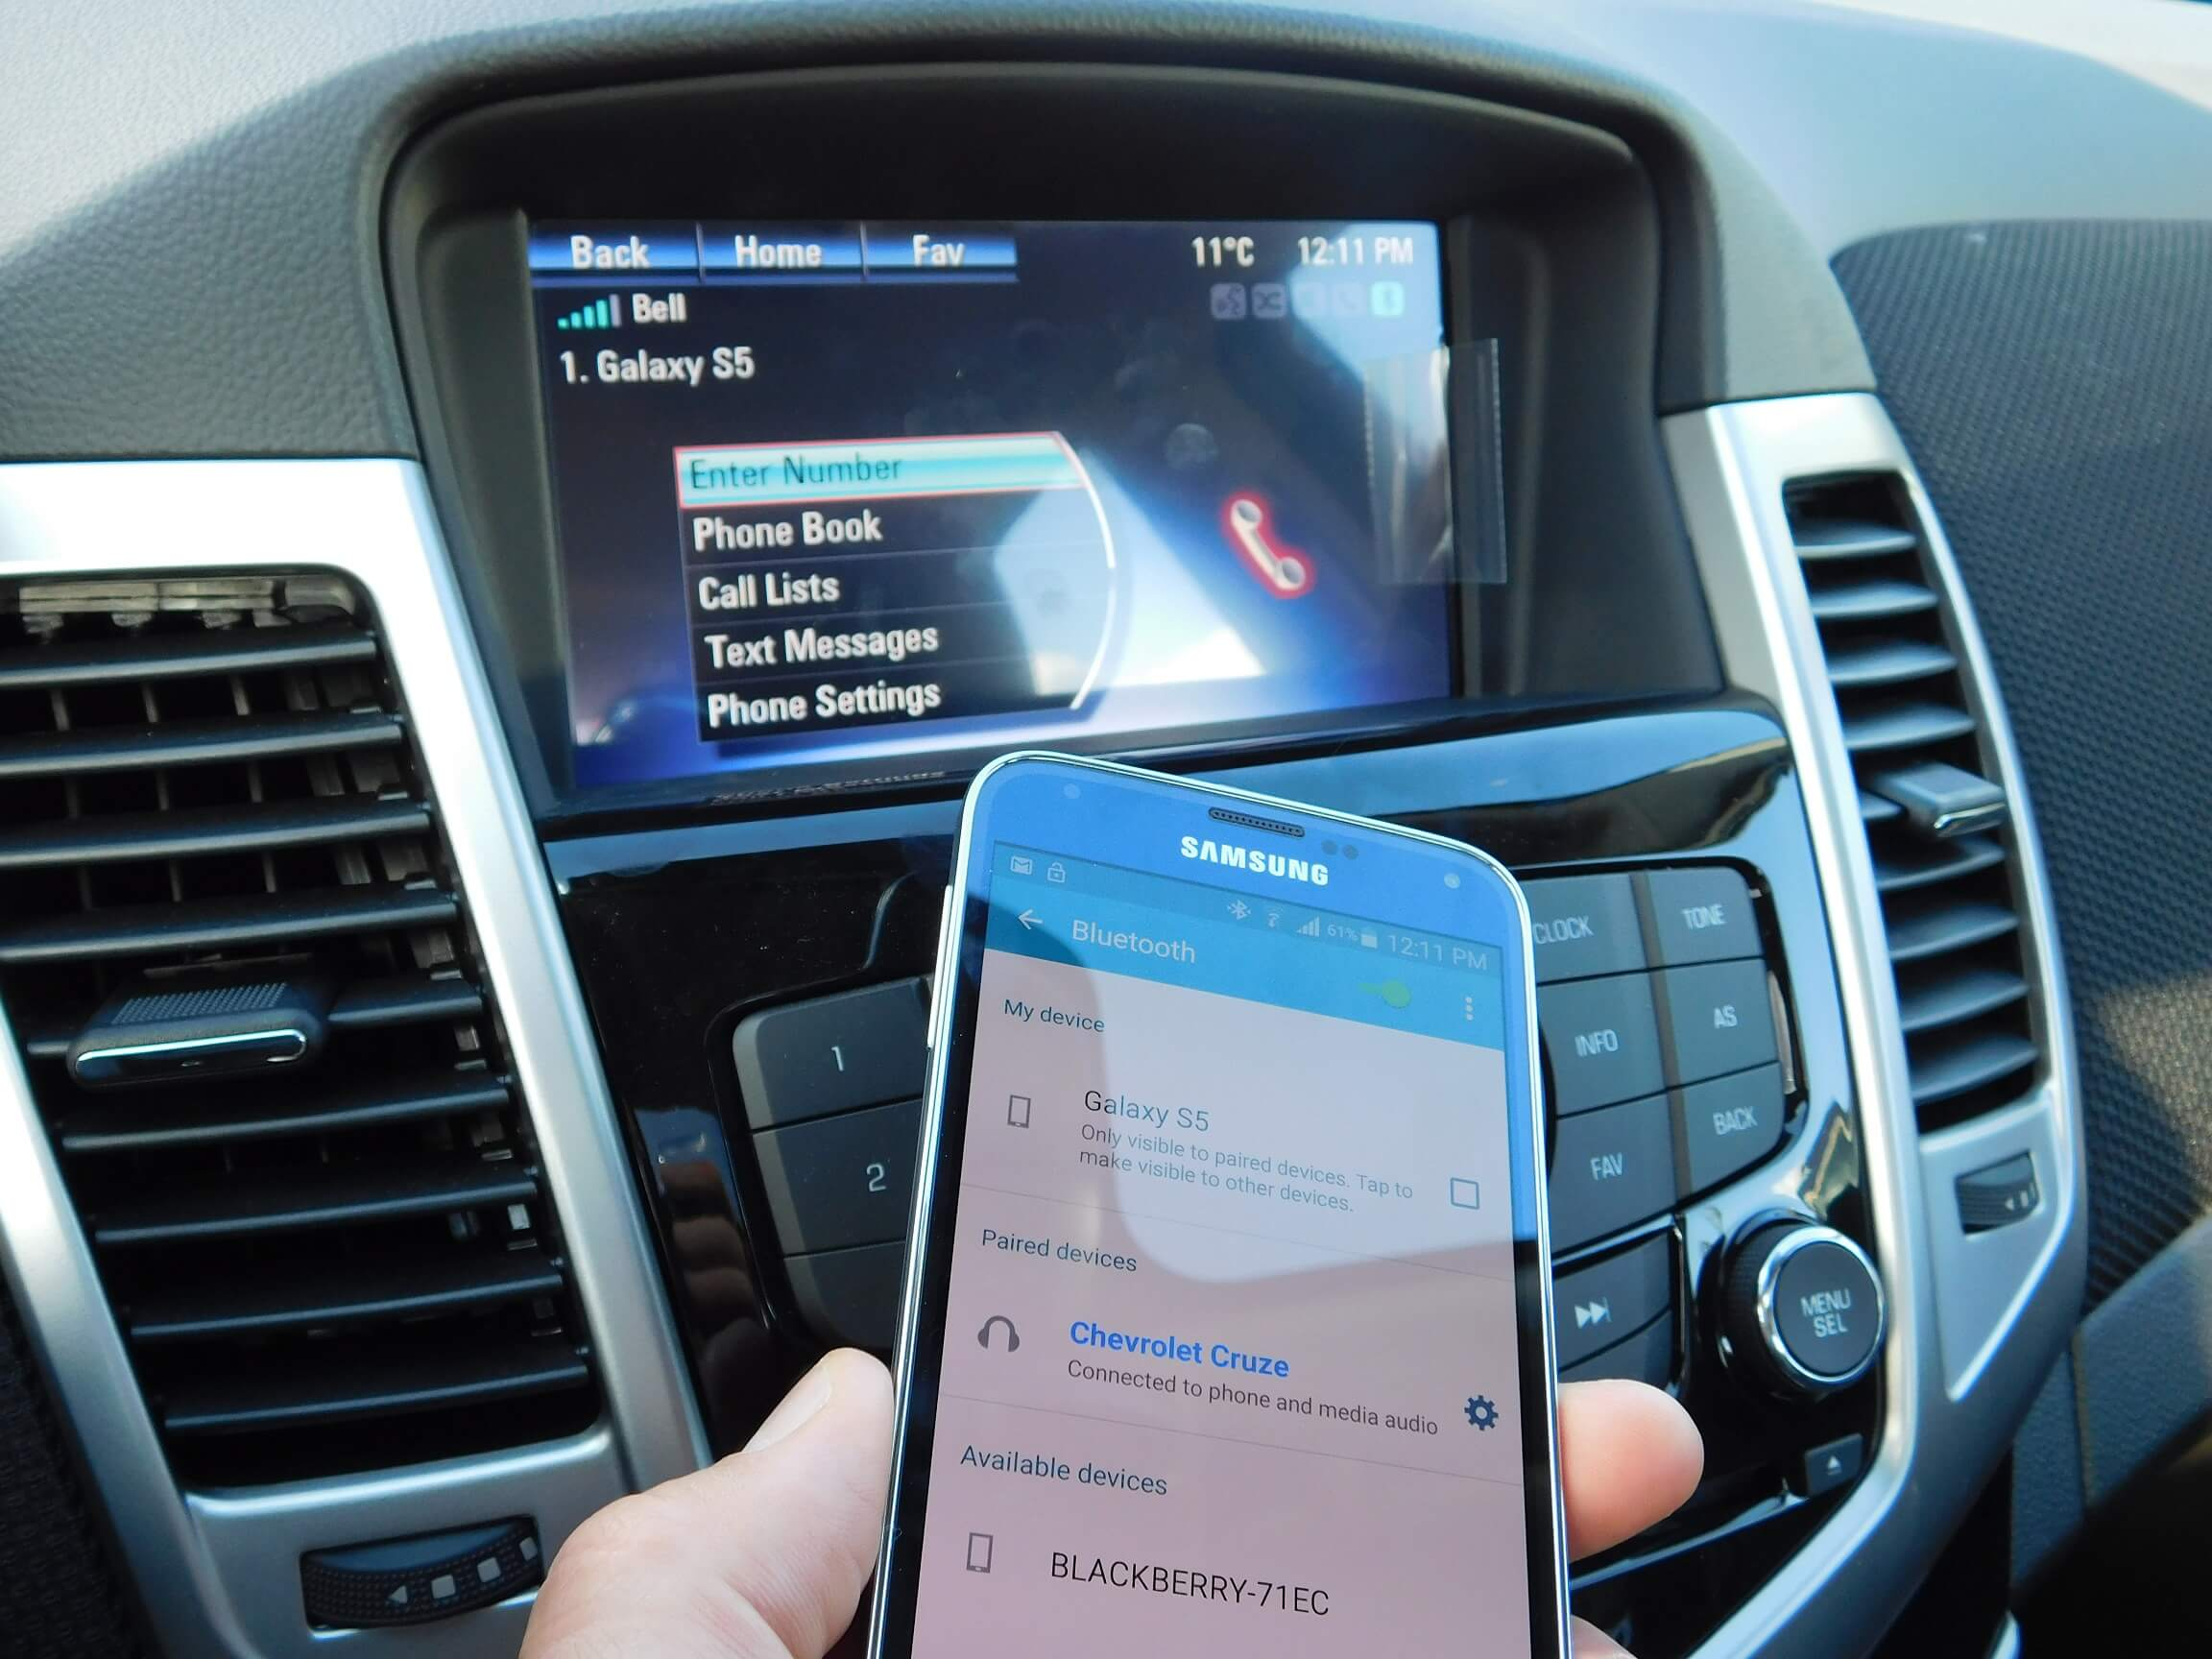 Chevrolet Cruze Infotainment System: Infotainment